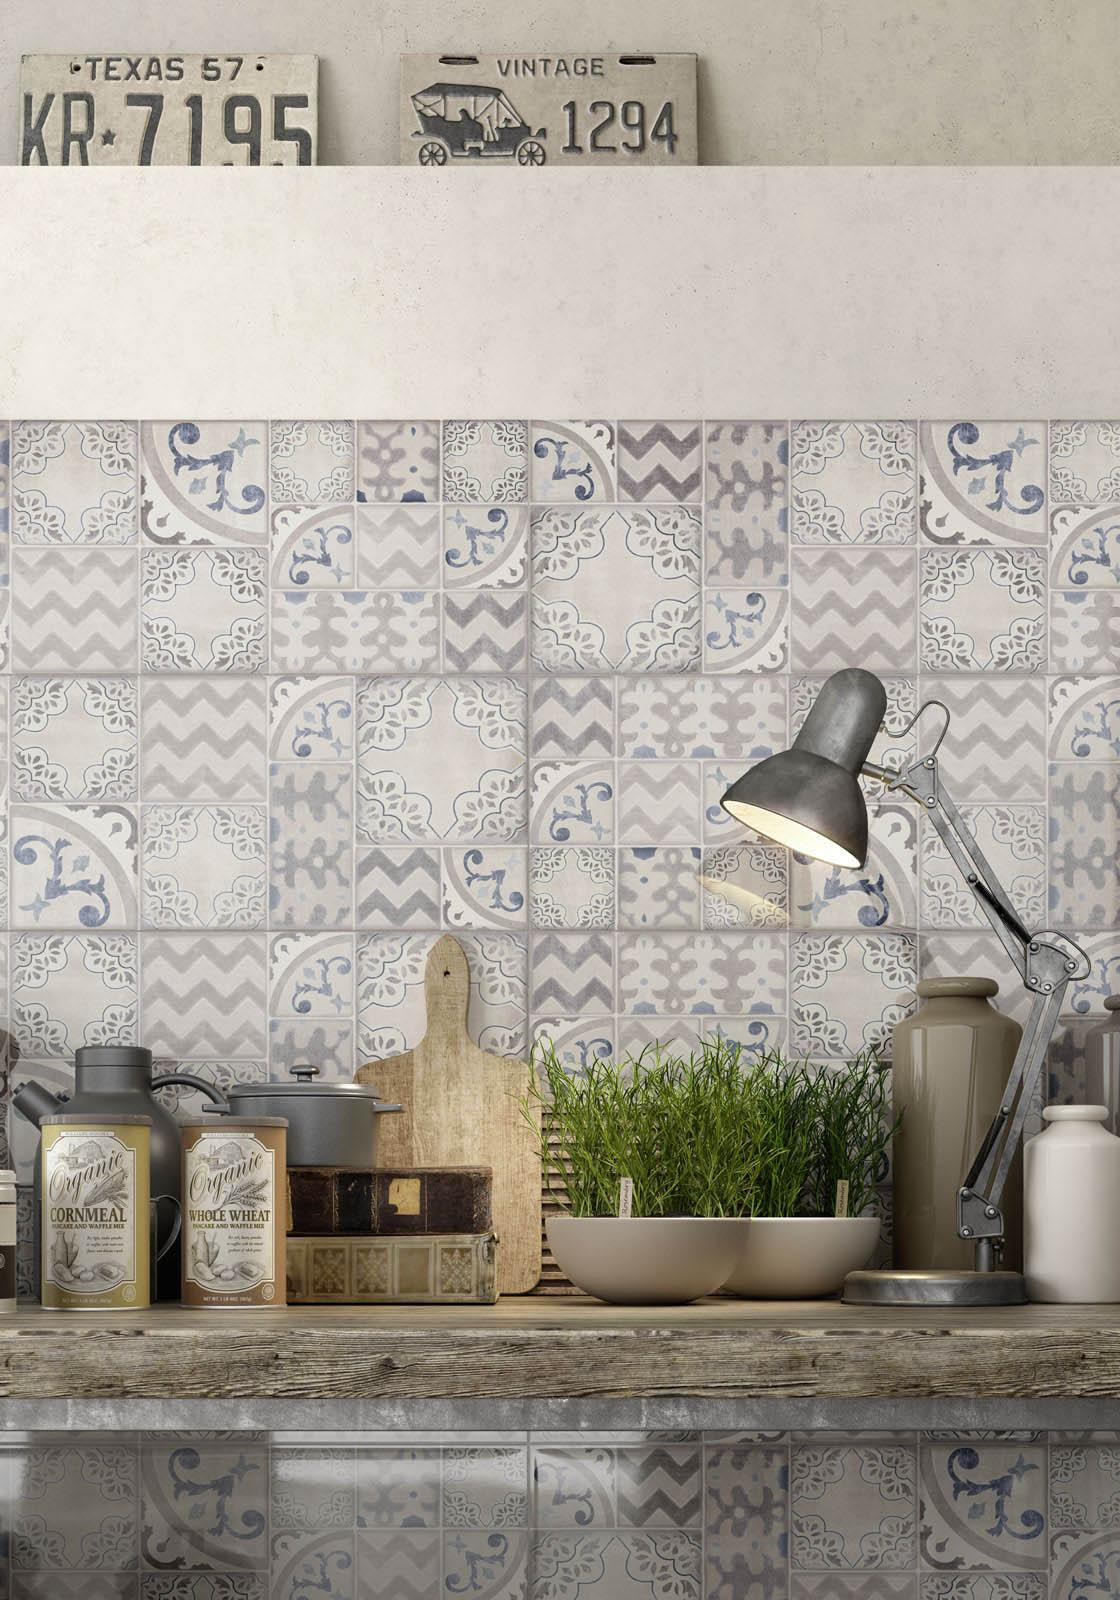 I rivestimenti perfetti per una cucina in stile industriale | Marazzi